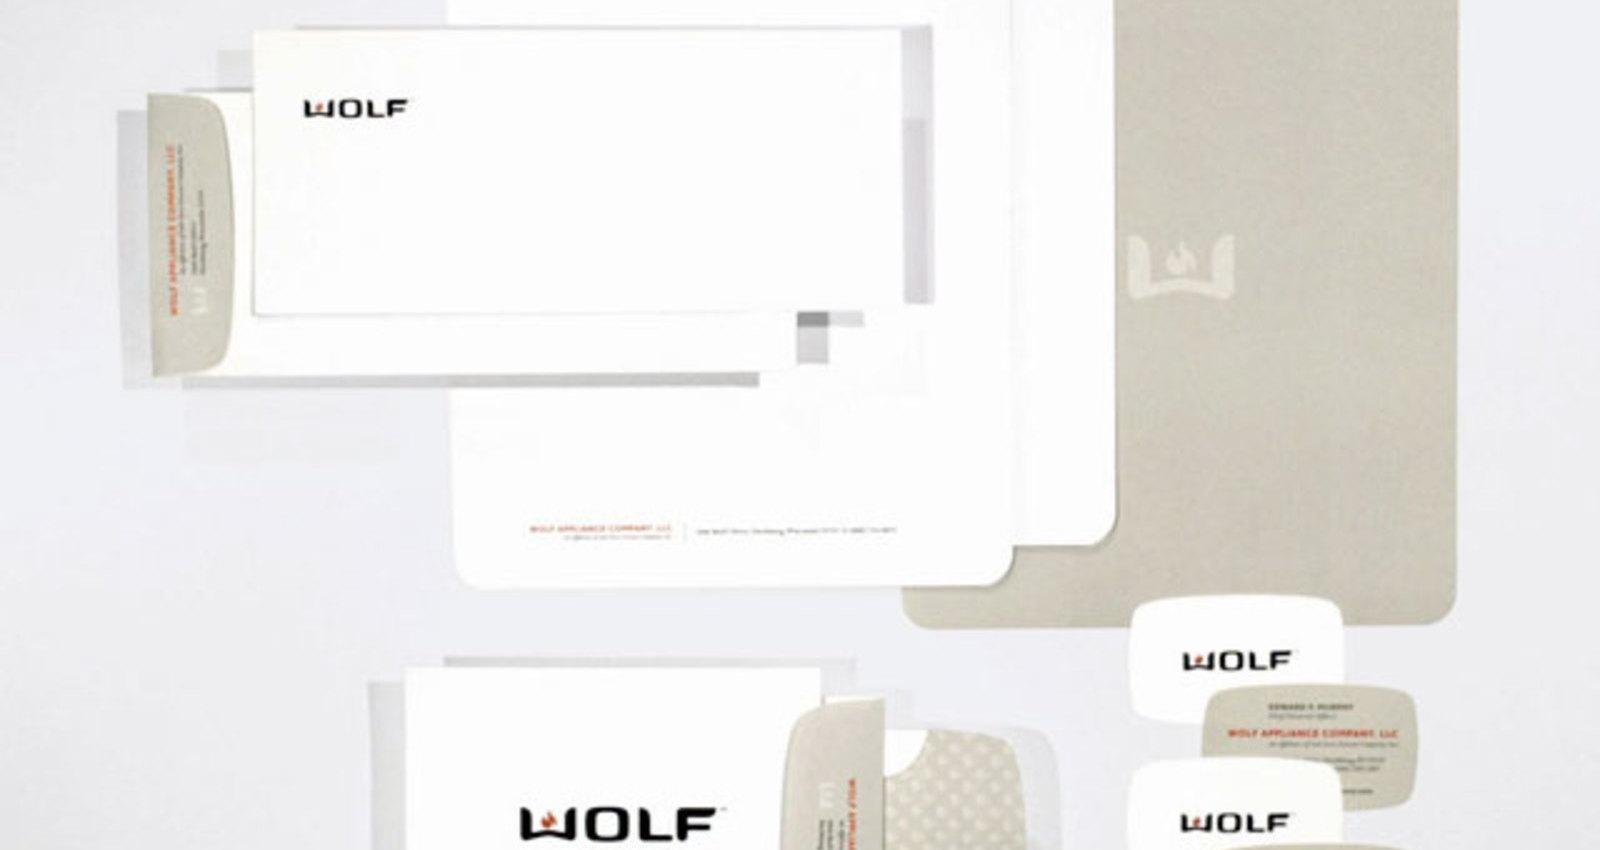 Wolf Corporate Identity